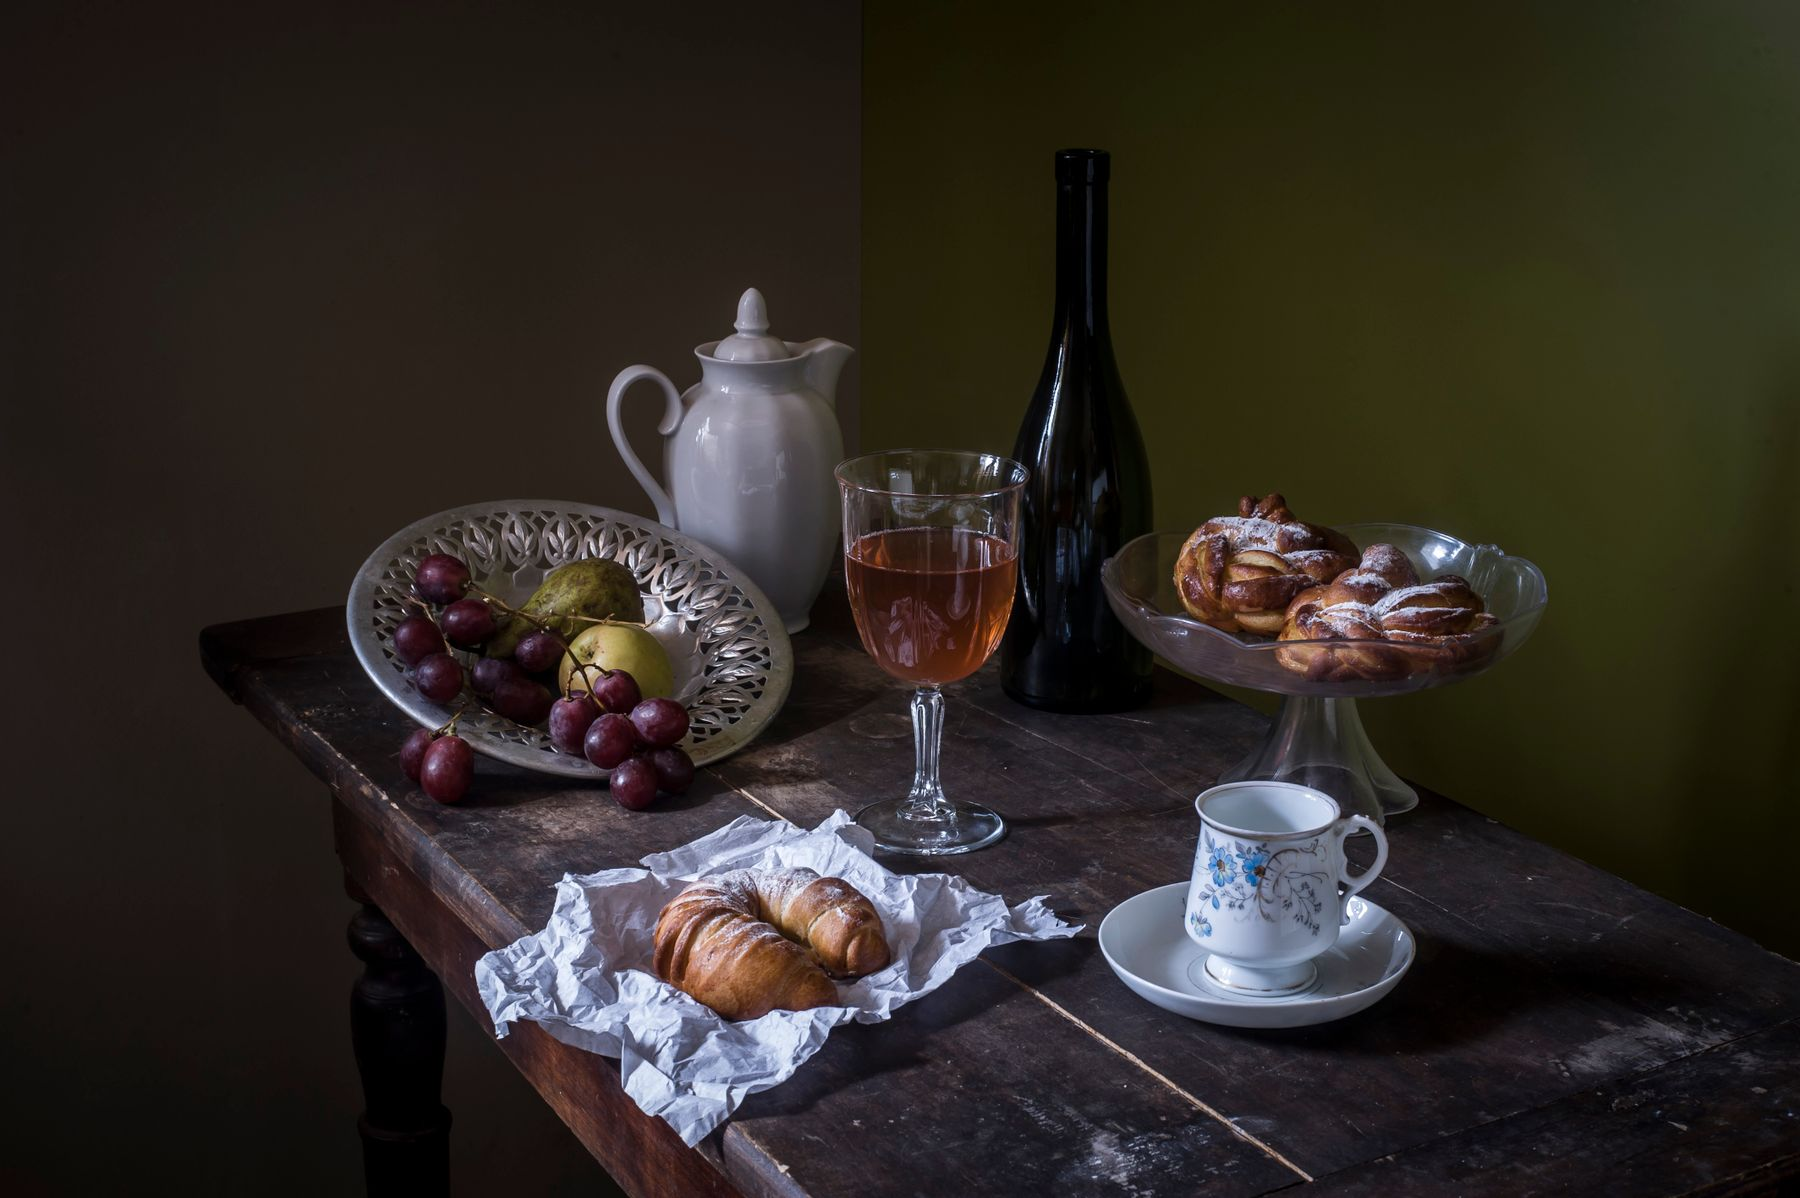 Натюрморт с выпечкой. бутылка бокал булочки чашка Кузнецова груши виноград